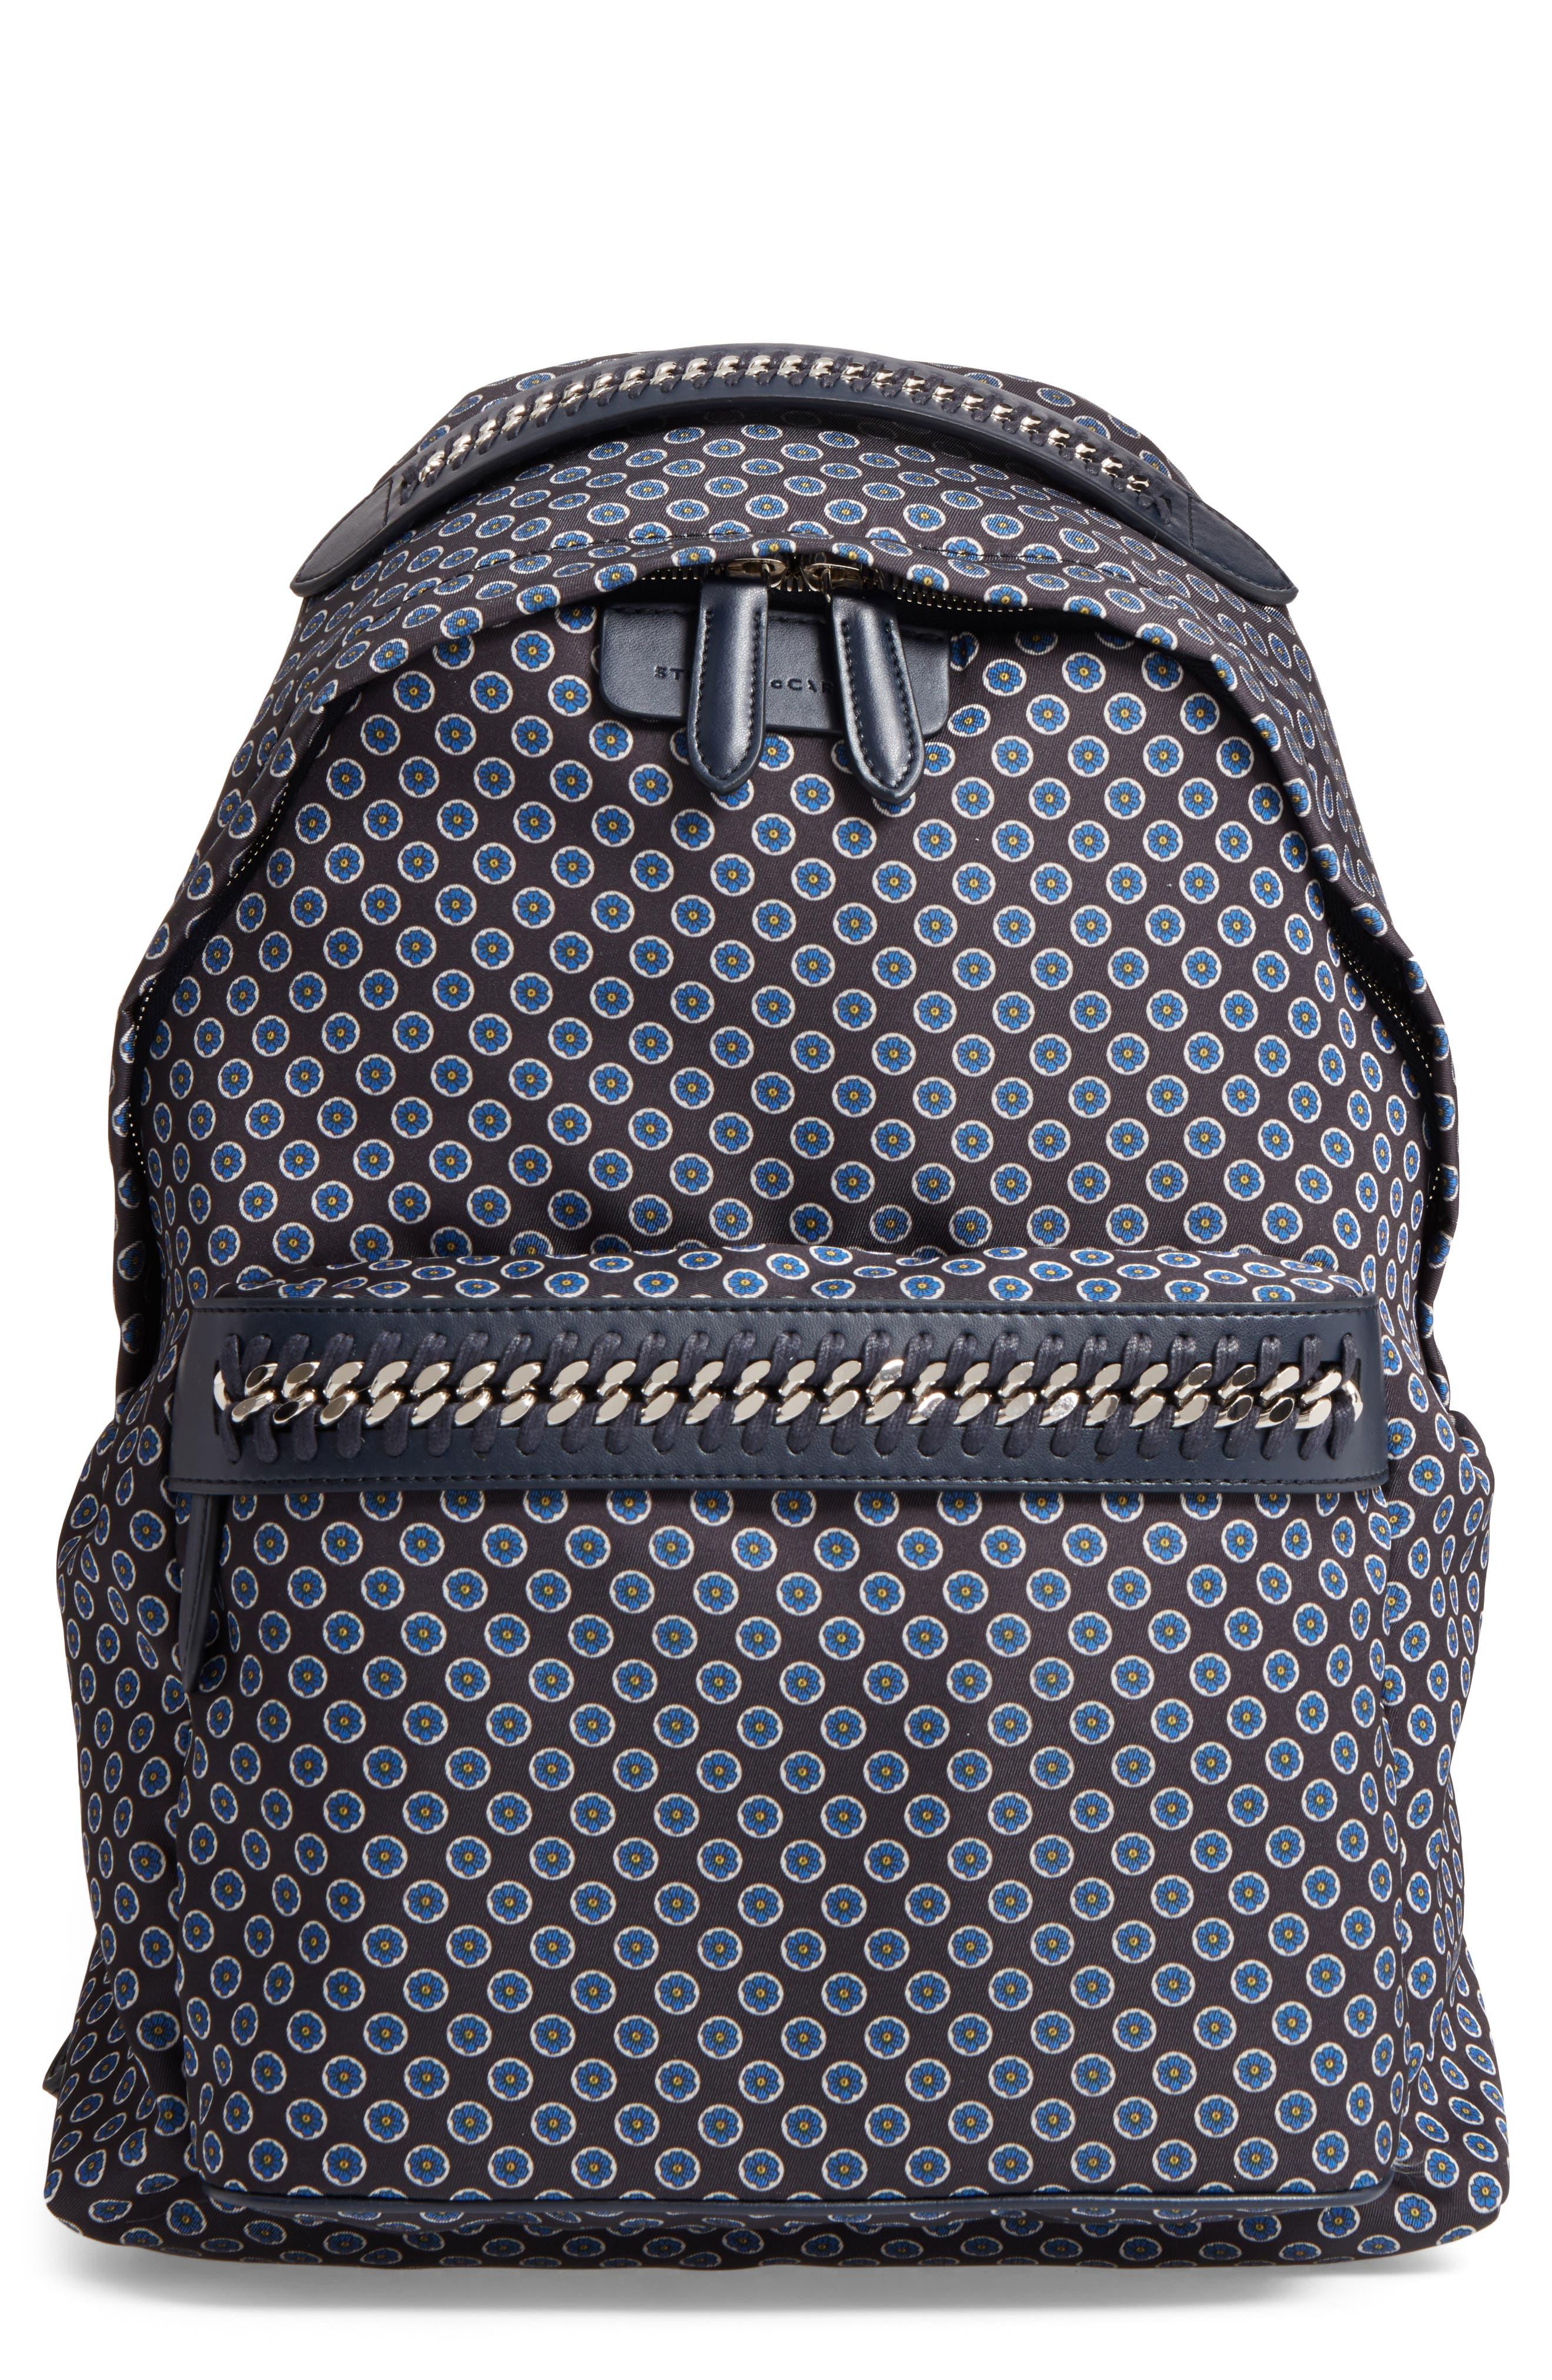 Stella McCartney Falabella Print Backpack